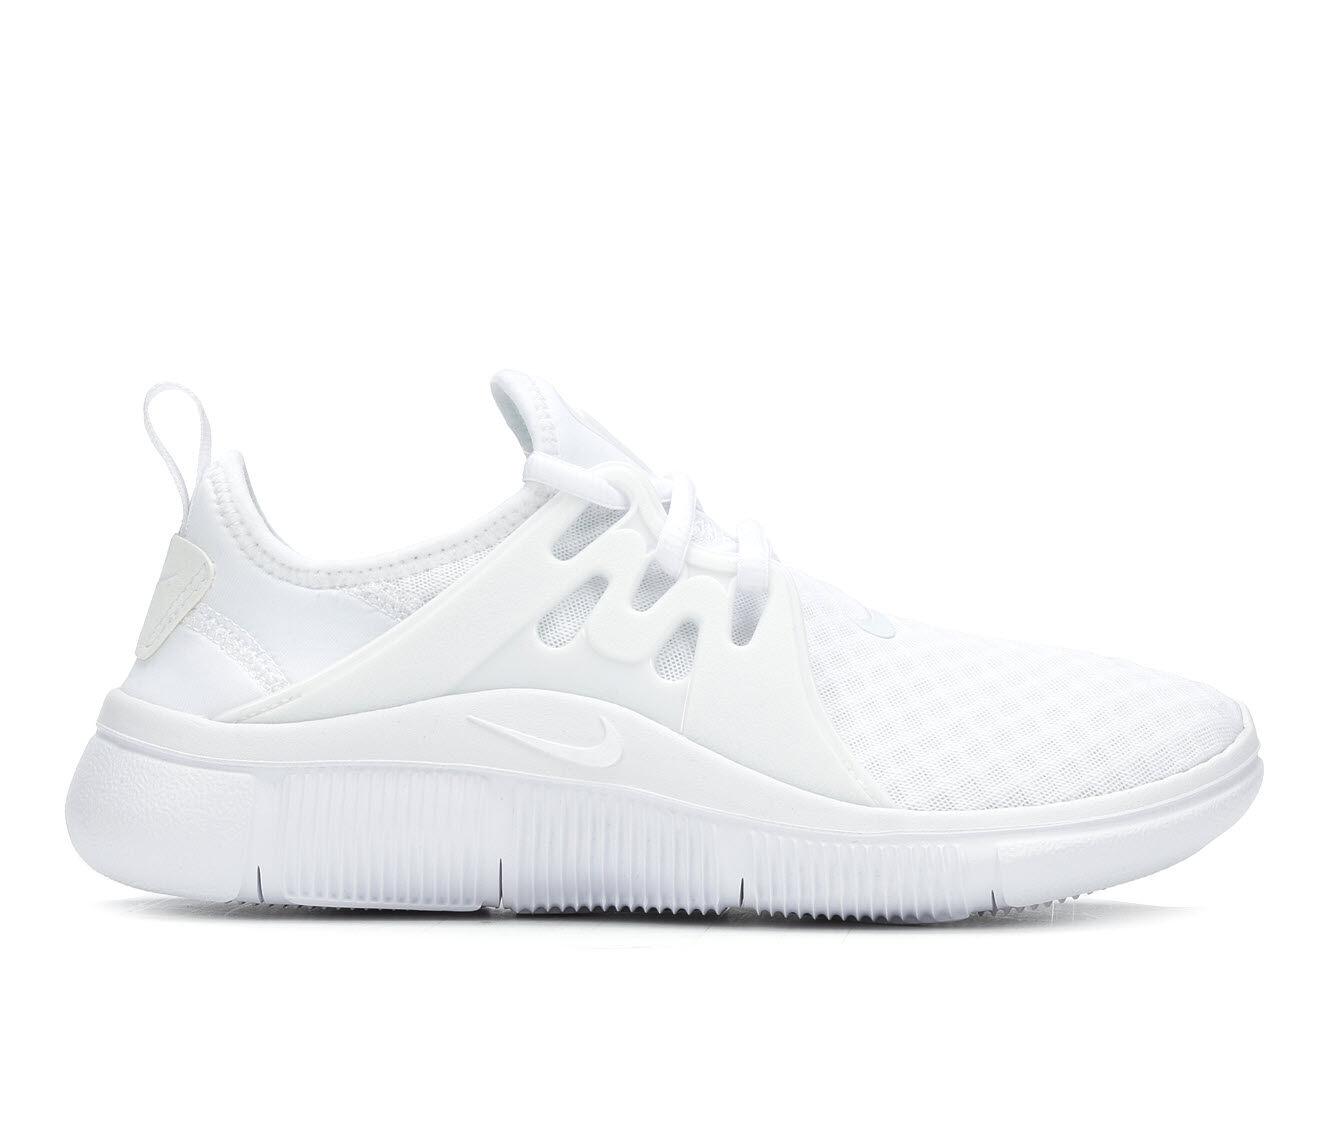 uk shoes_kd4439